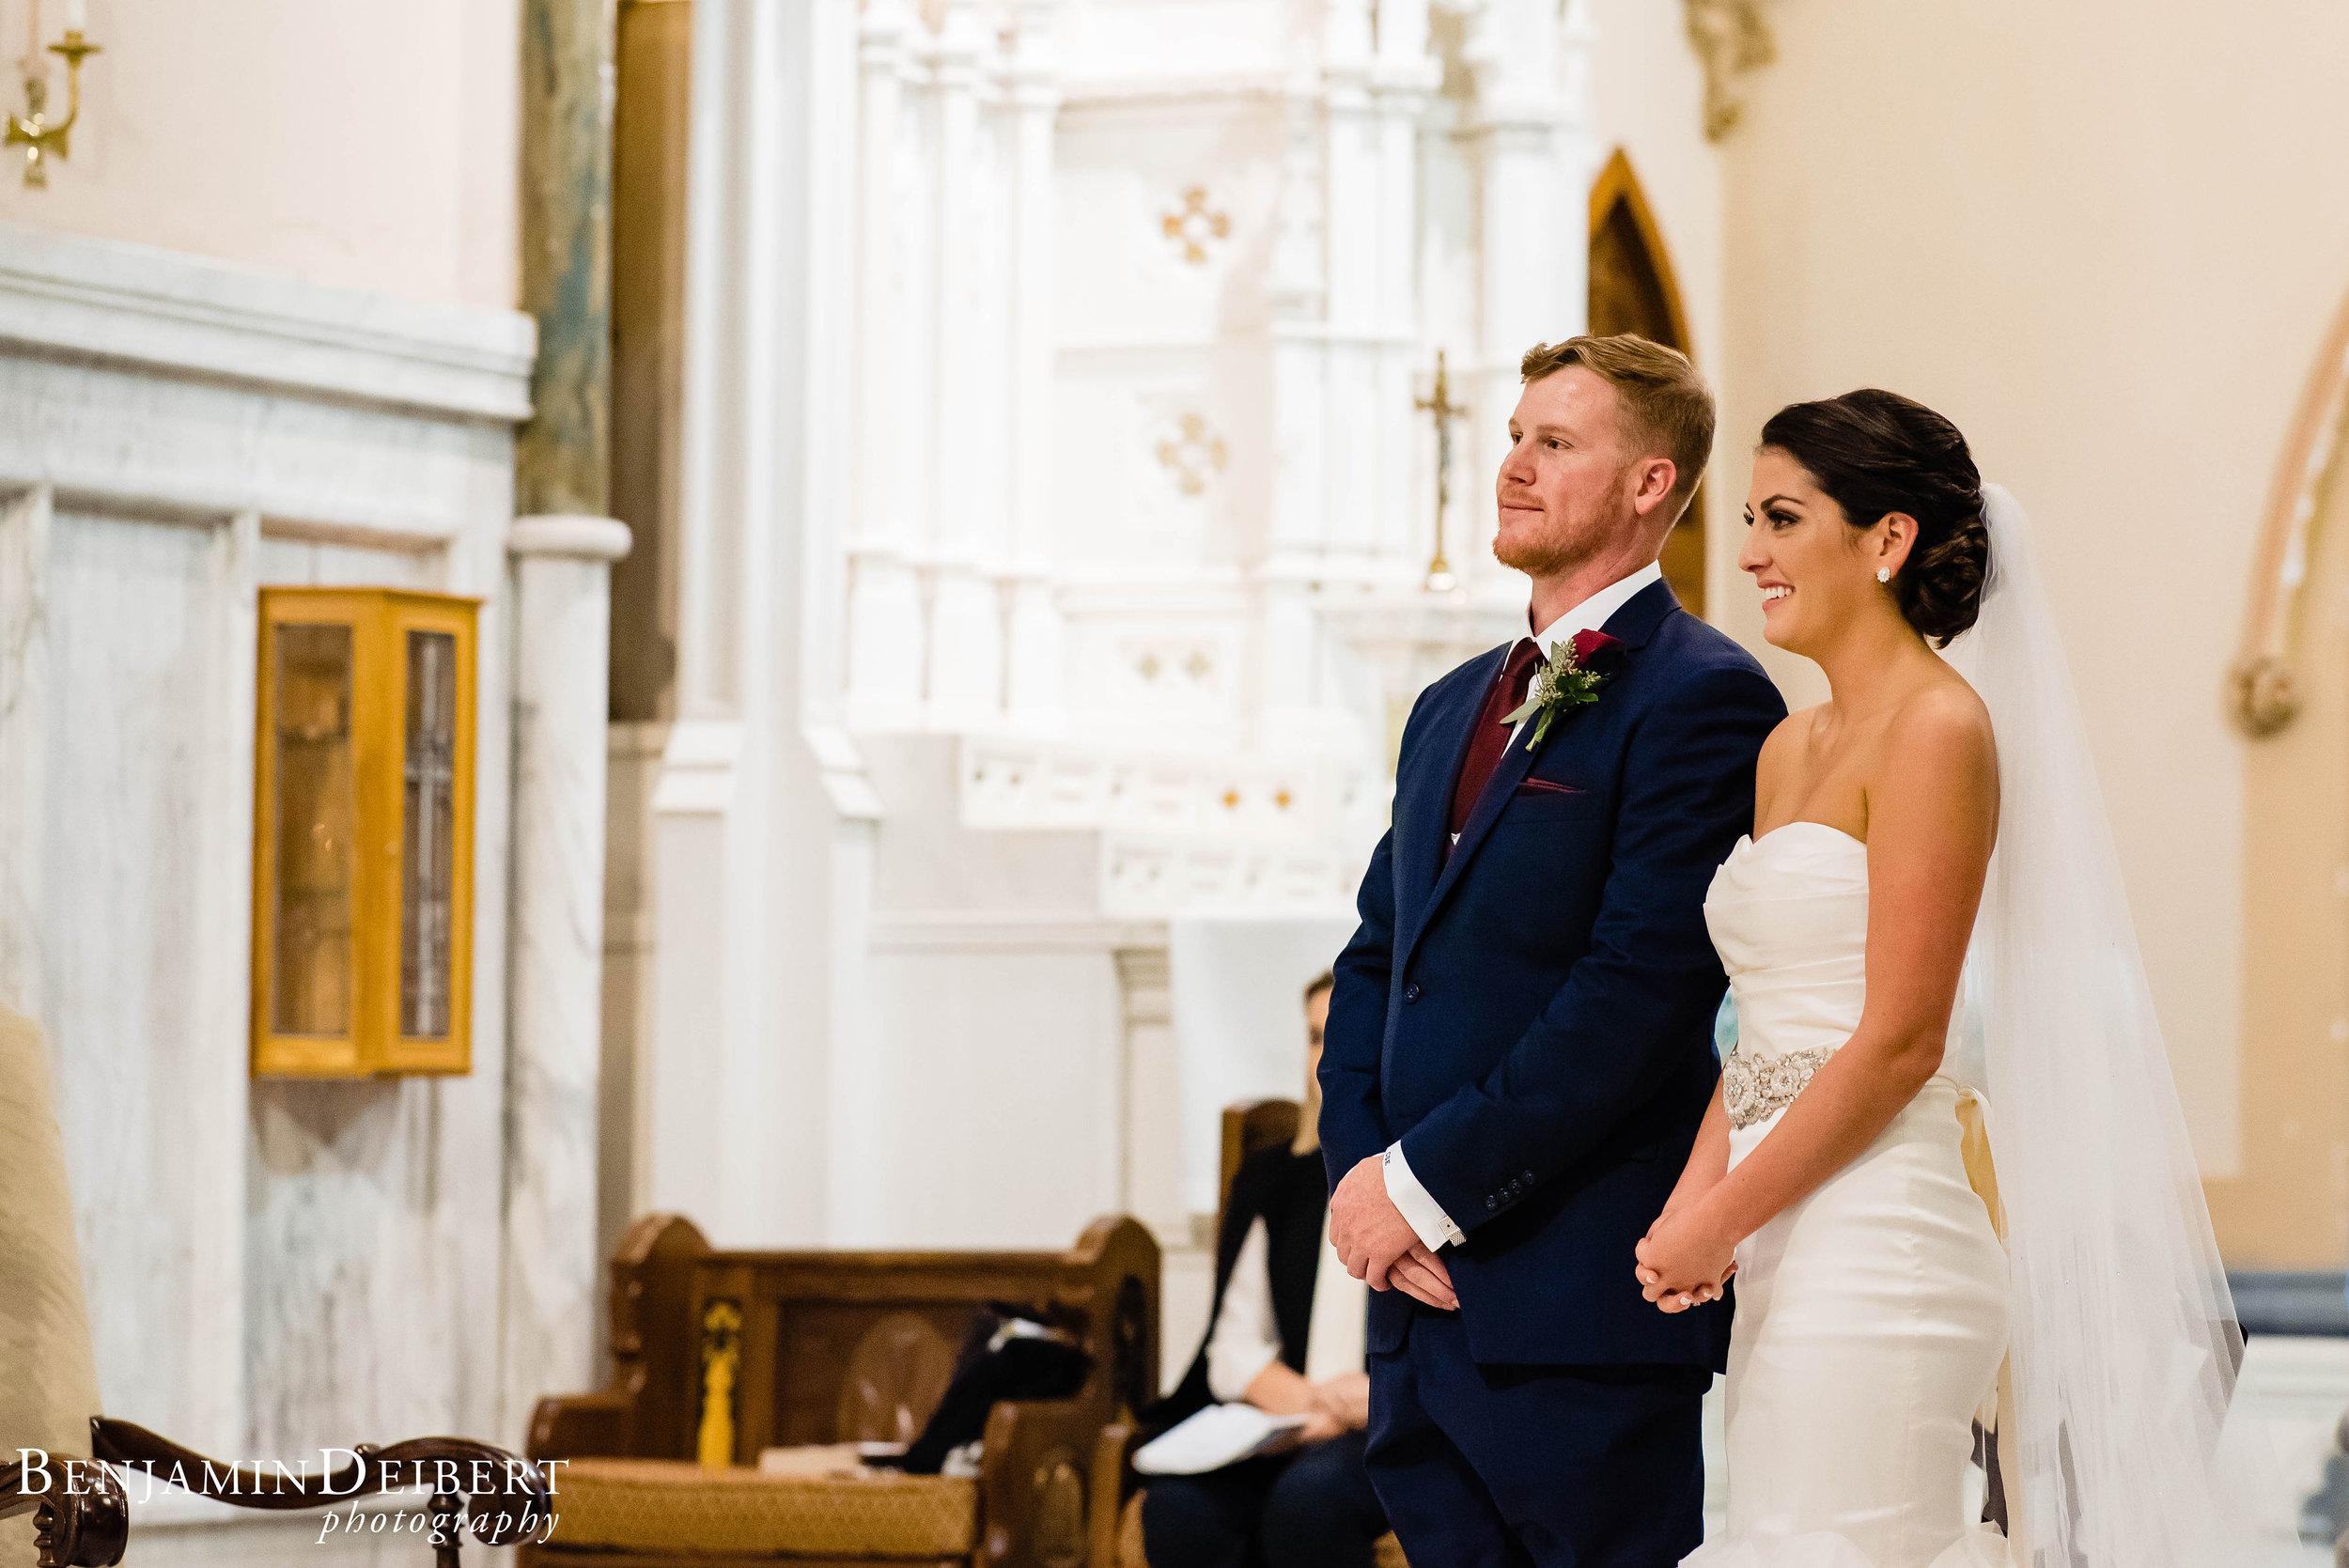 TeghanandChris_BridgemensBallroom_Wedding-46.jpg